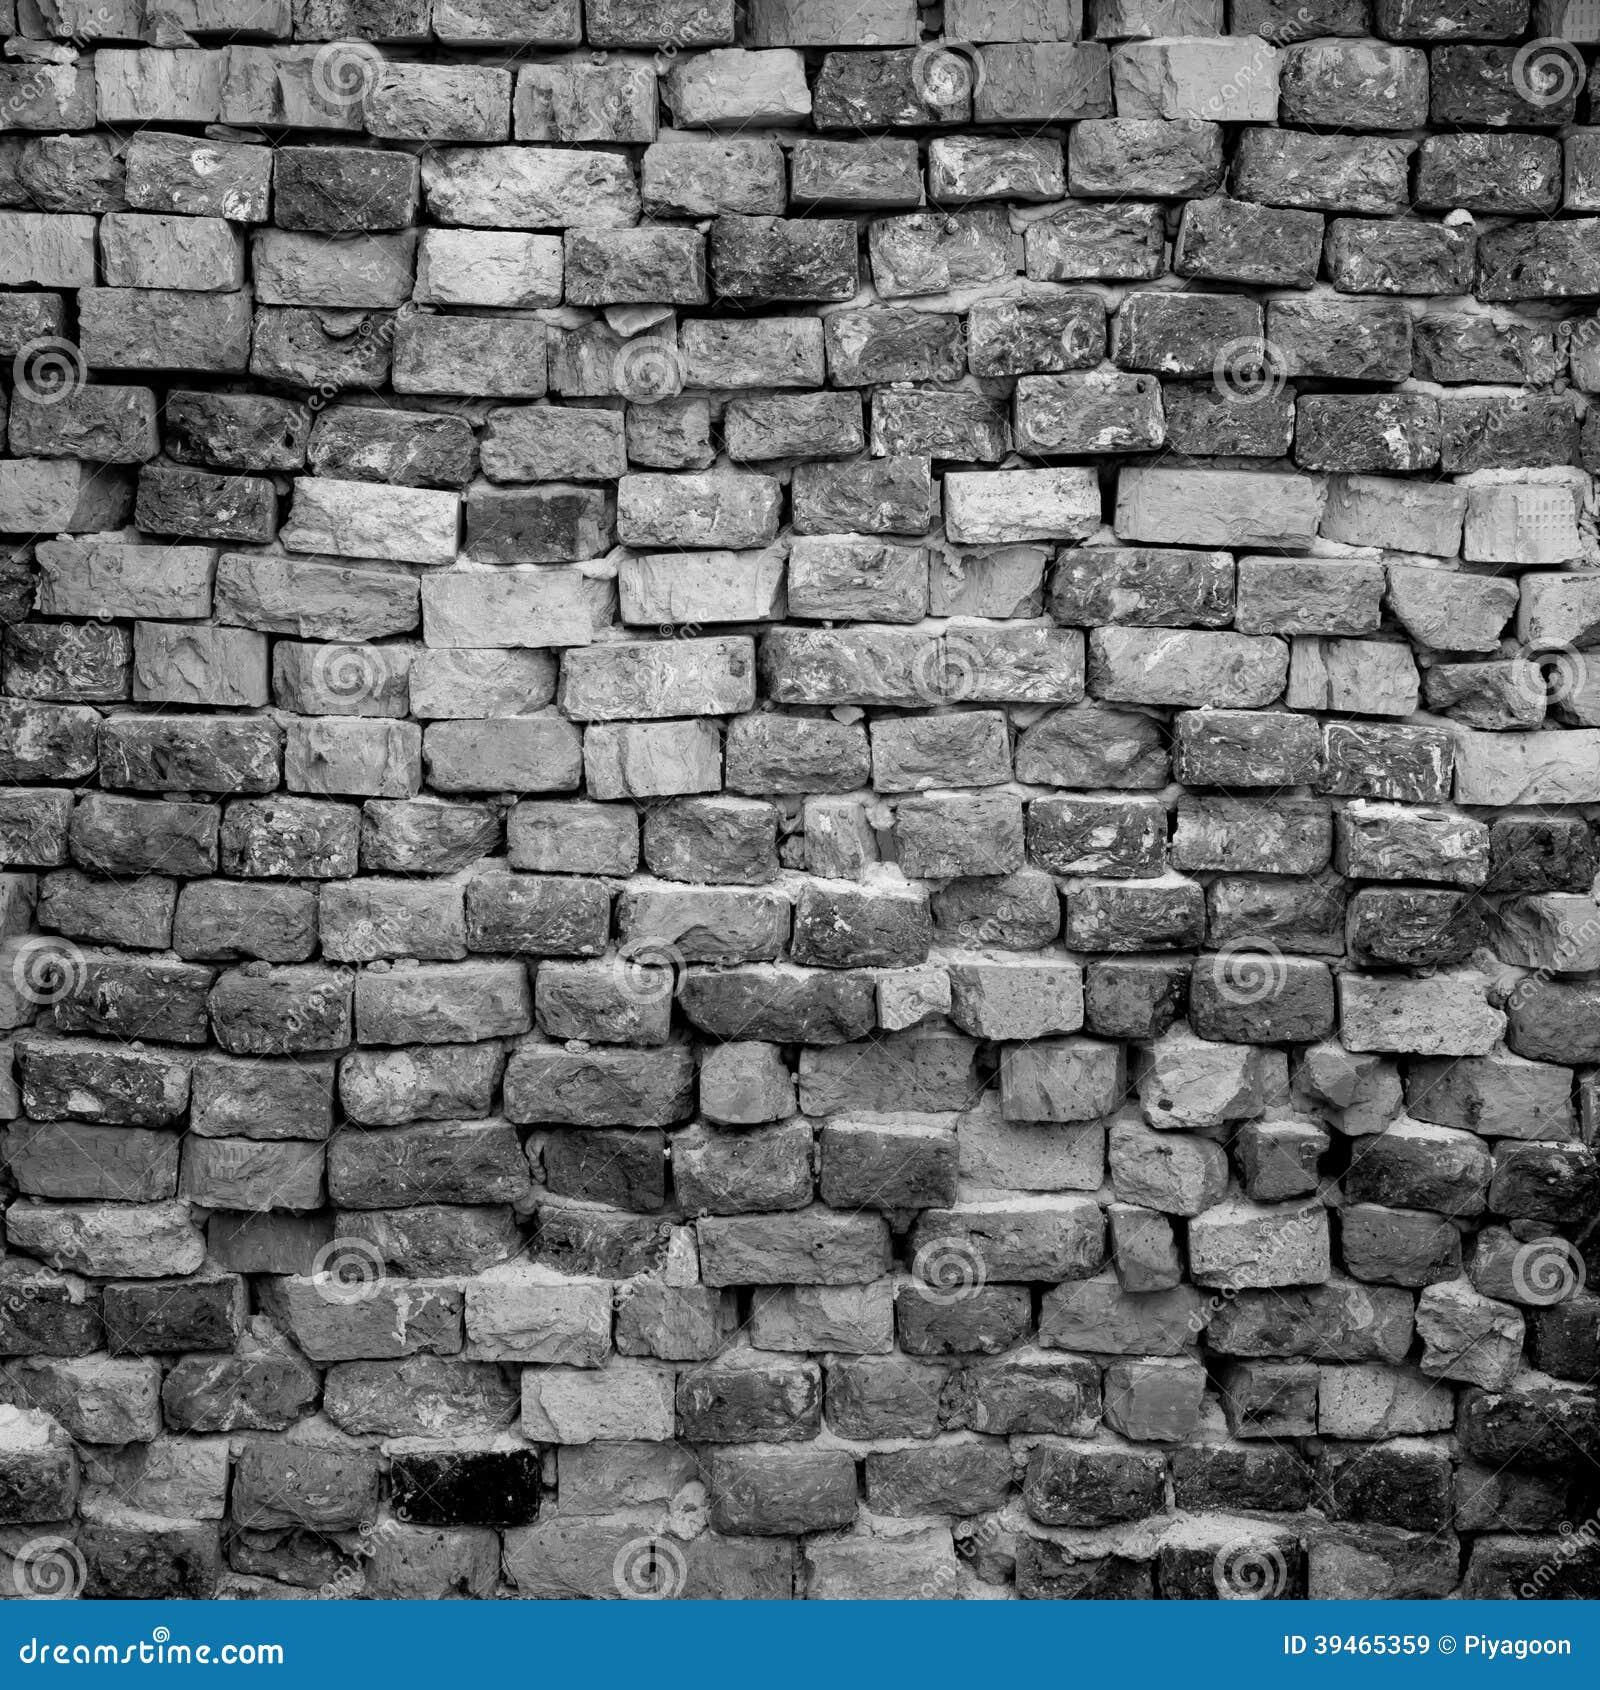 Black And White Brick Wall Stock Photo Image 39465359